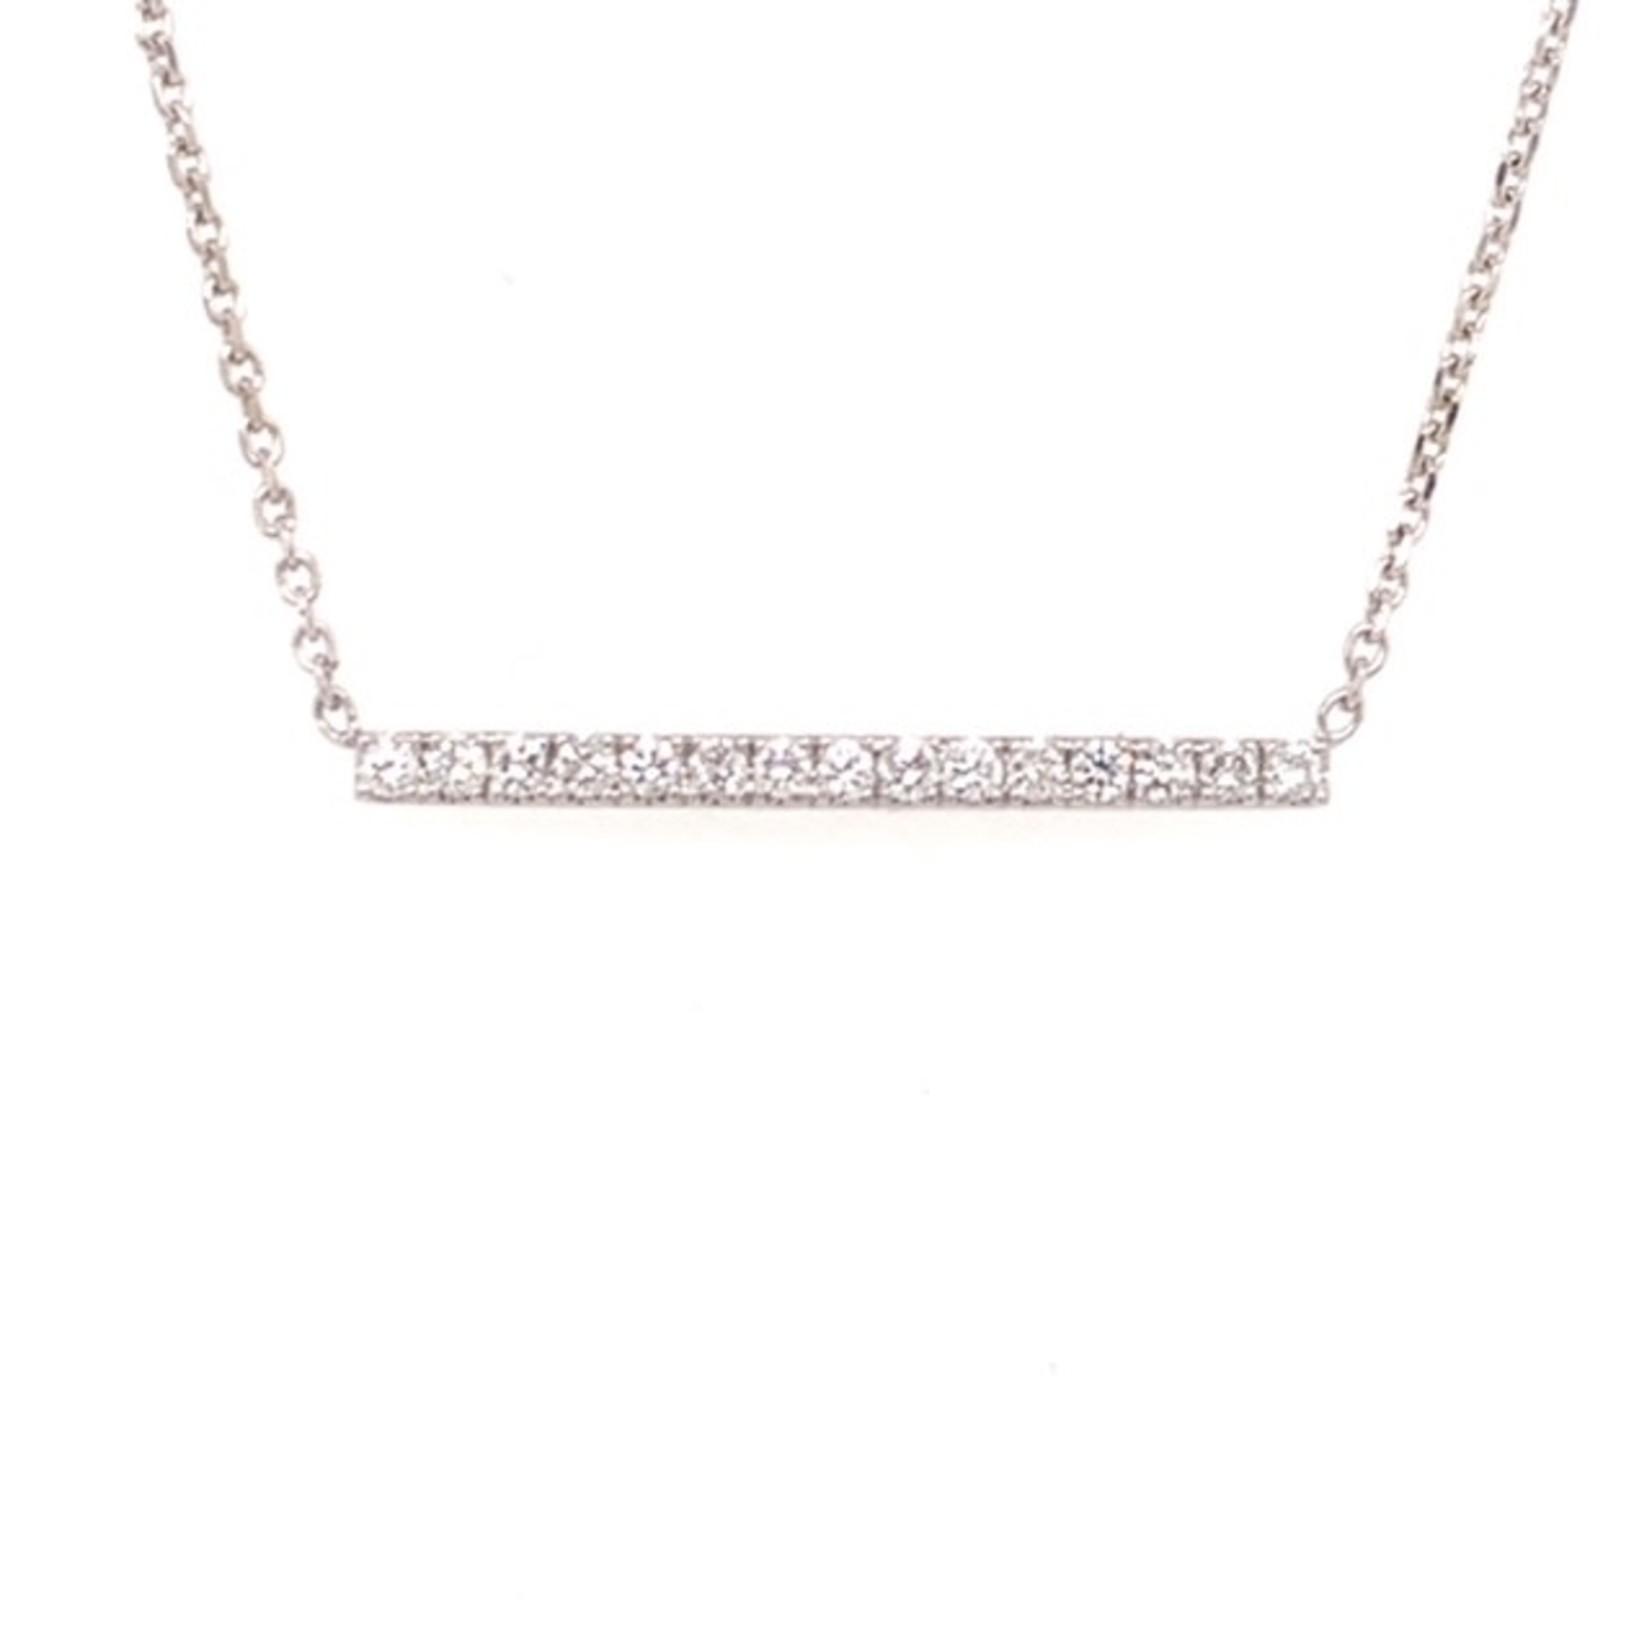 On The Edge Unequivocal Strength Necklace - 14kt Diamond Pendant